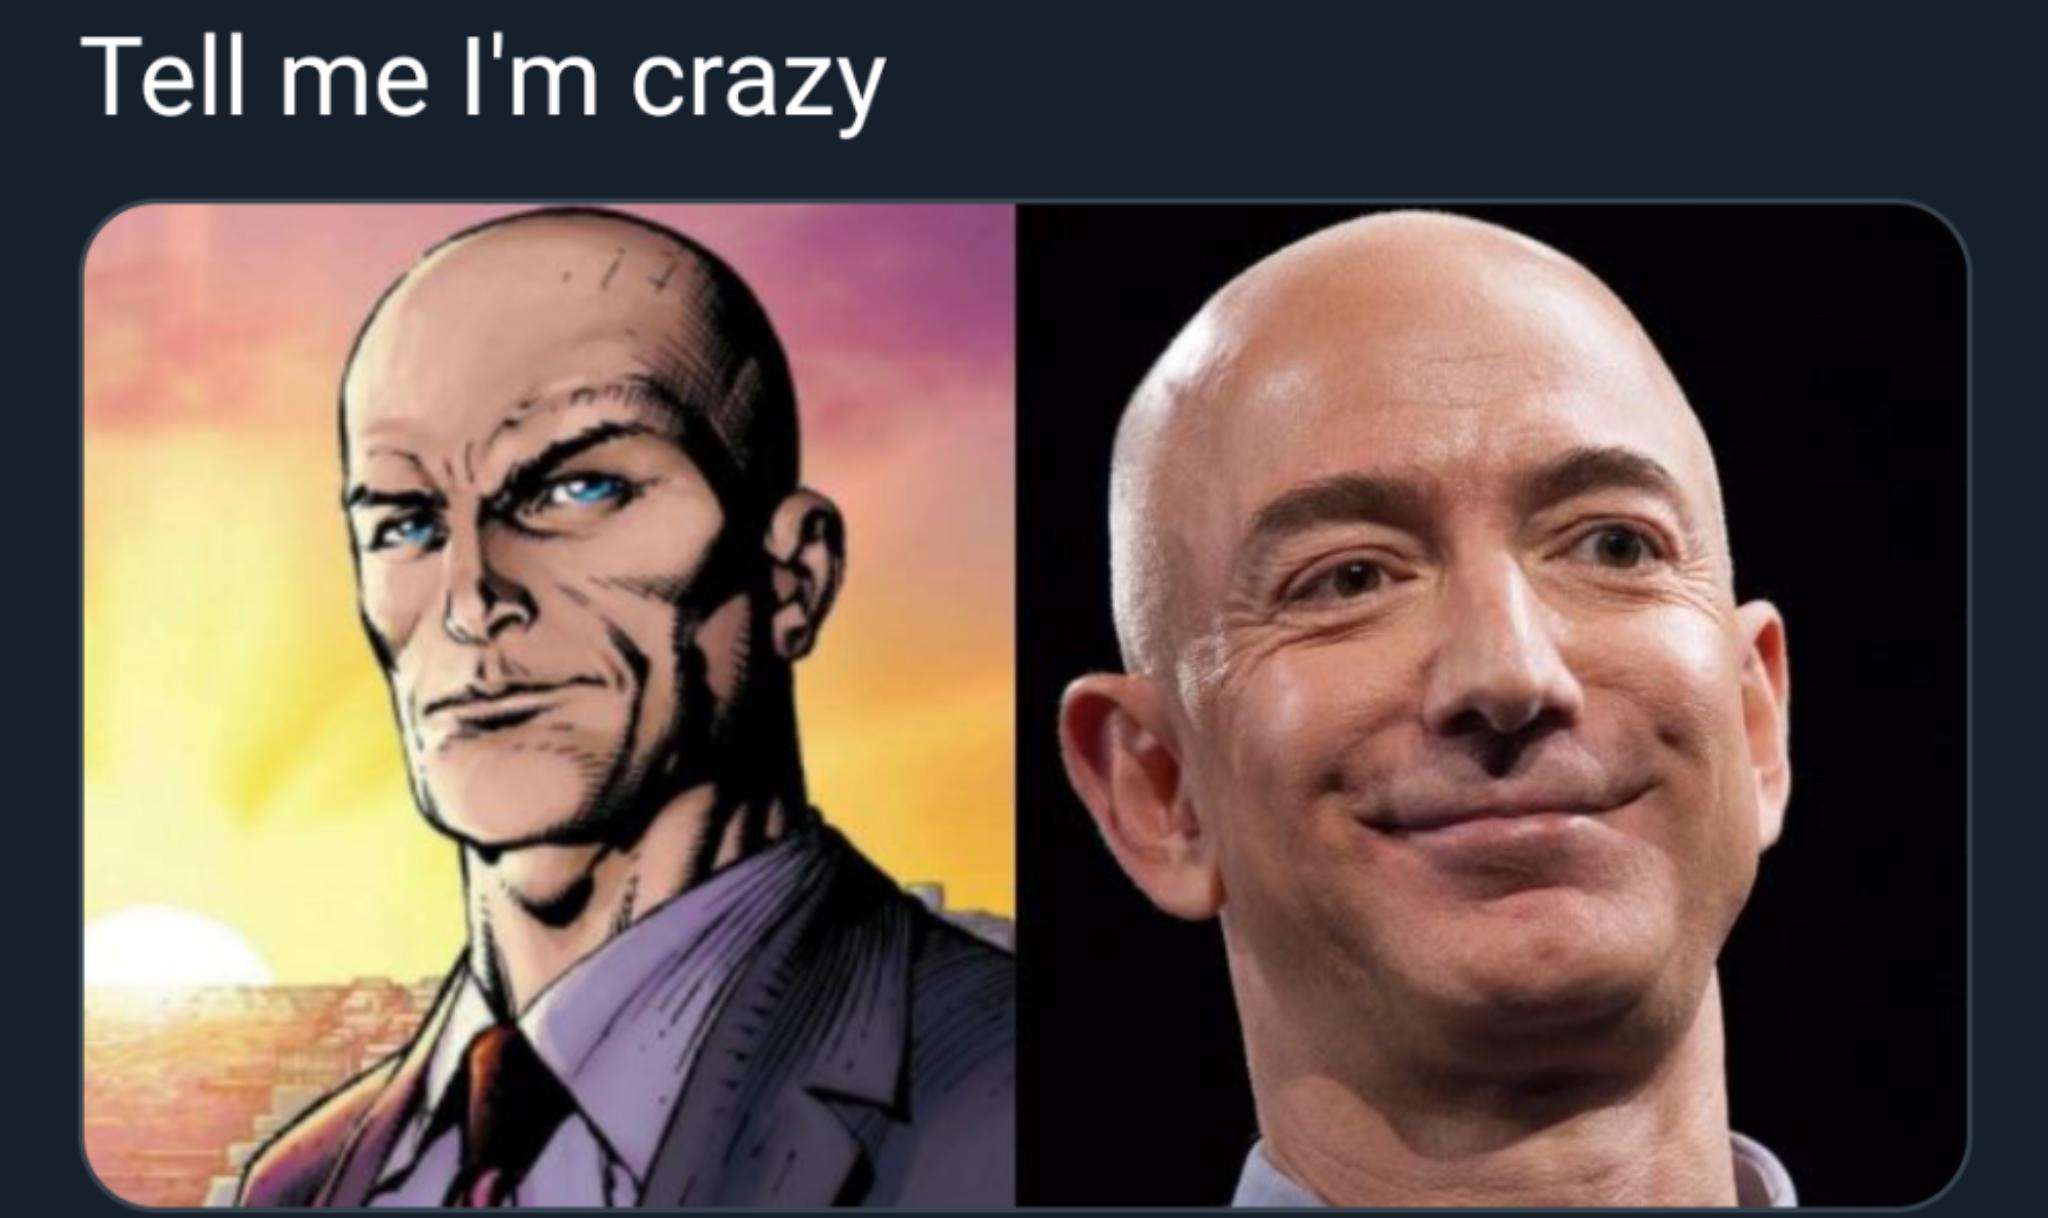 Jeff Bezos is Lex Luthor